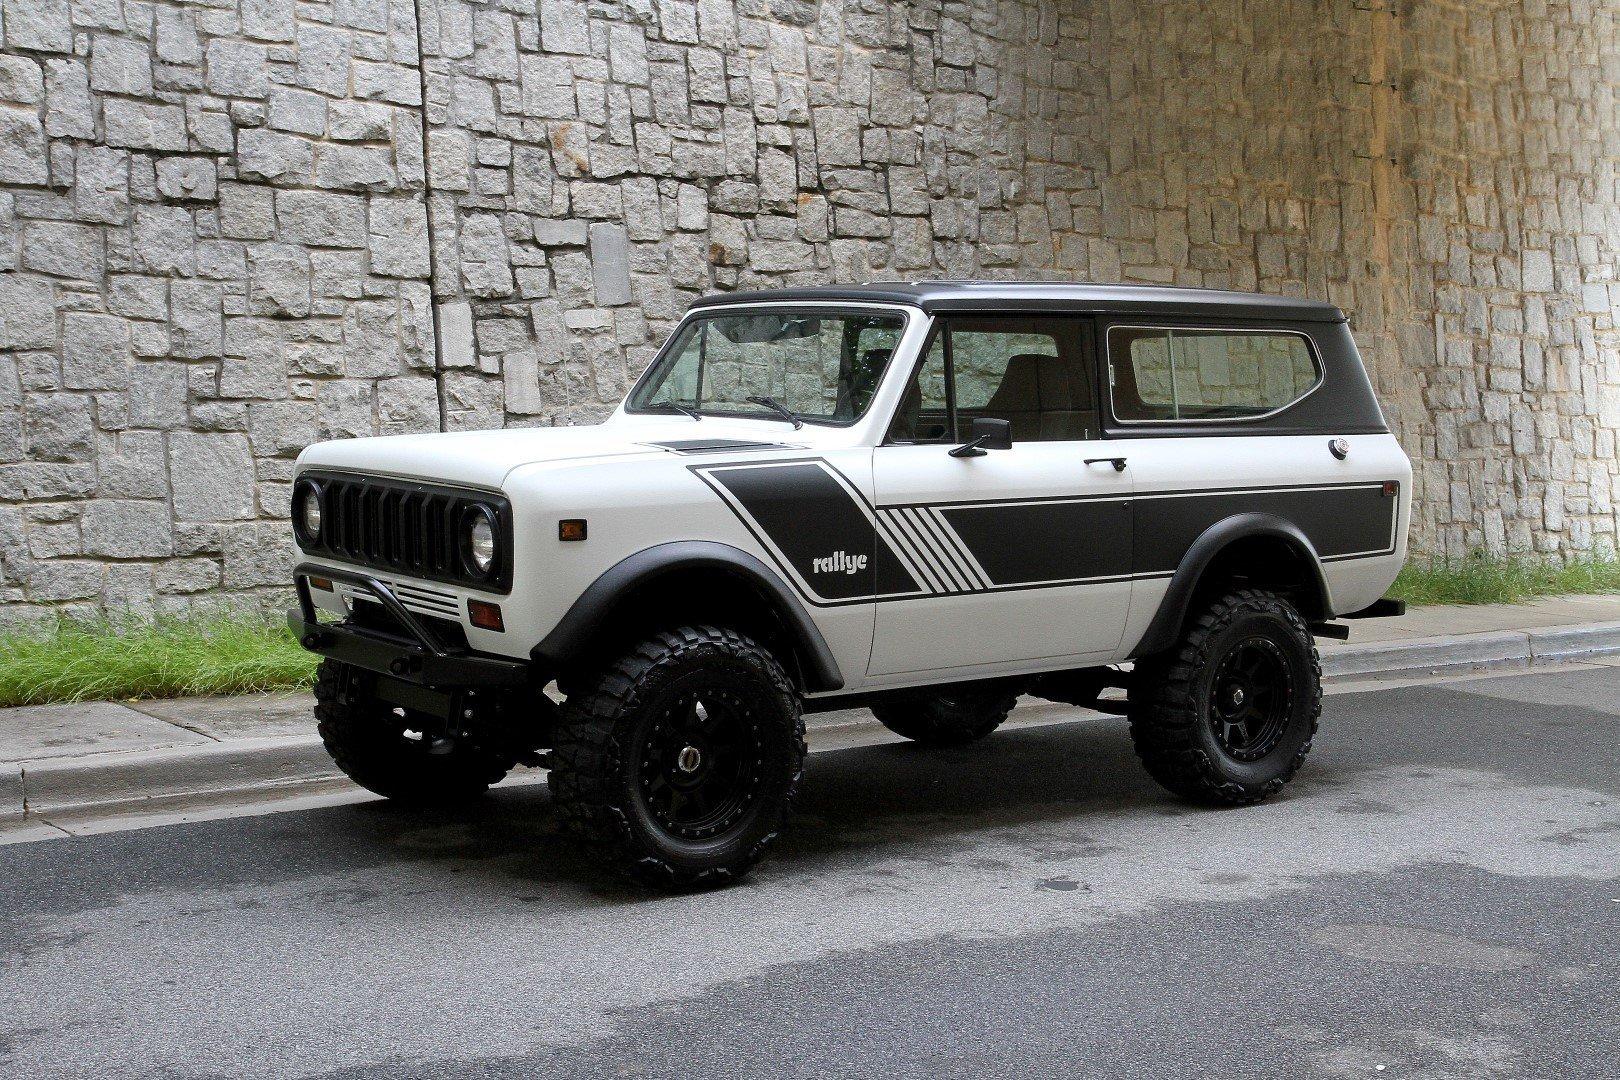 1975 International Scout II 4x4 - Antique Car - Greenville, TX 75402